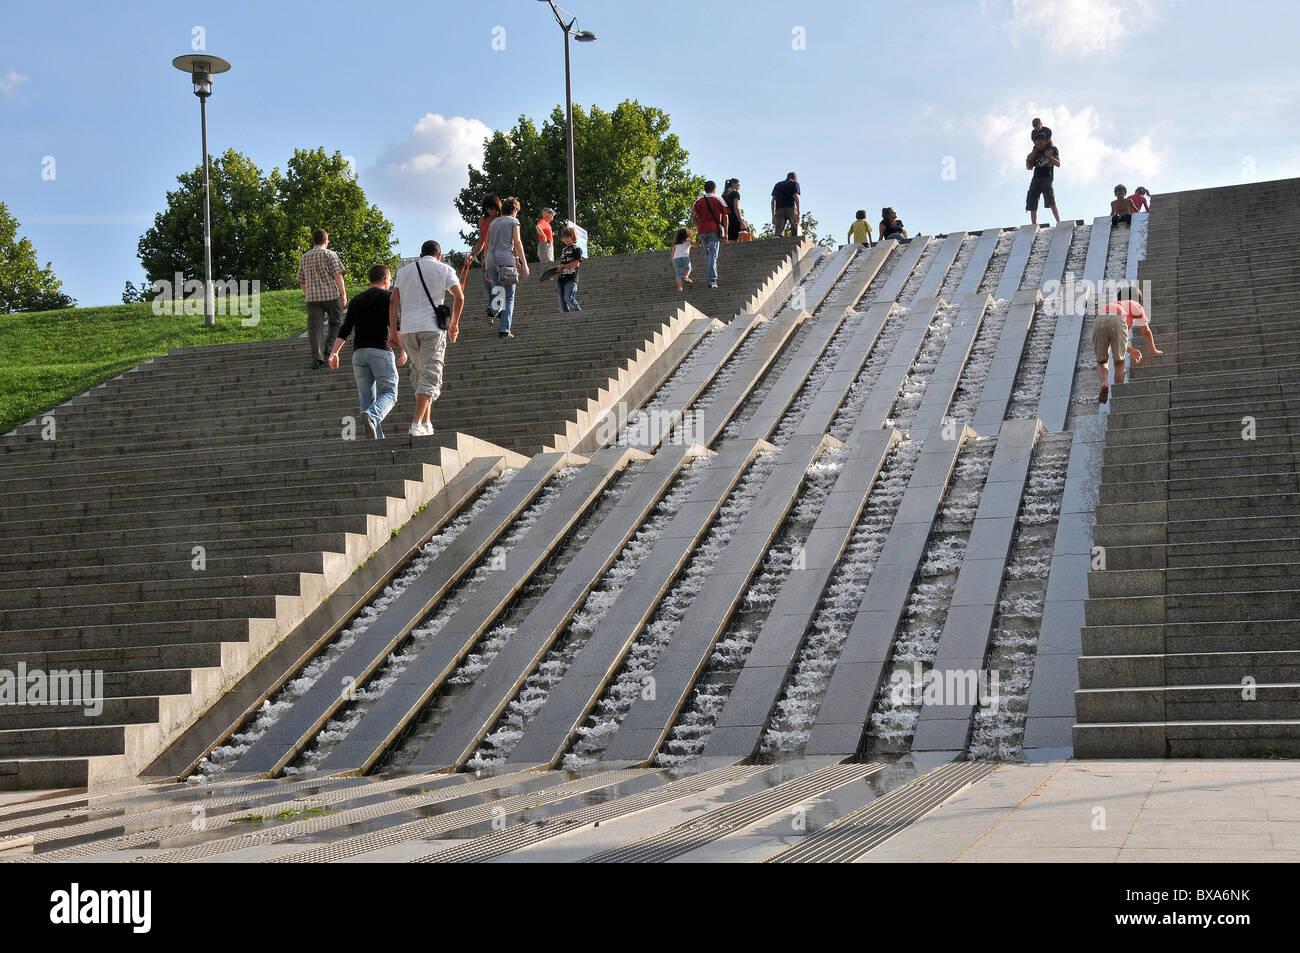 fountain Bercy park, Paris, France - Stock Image